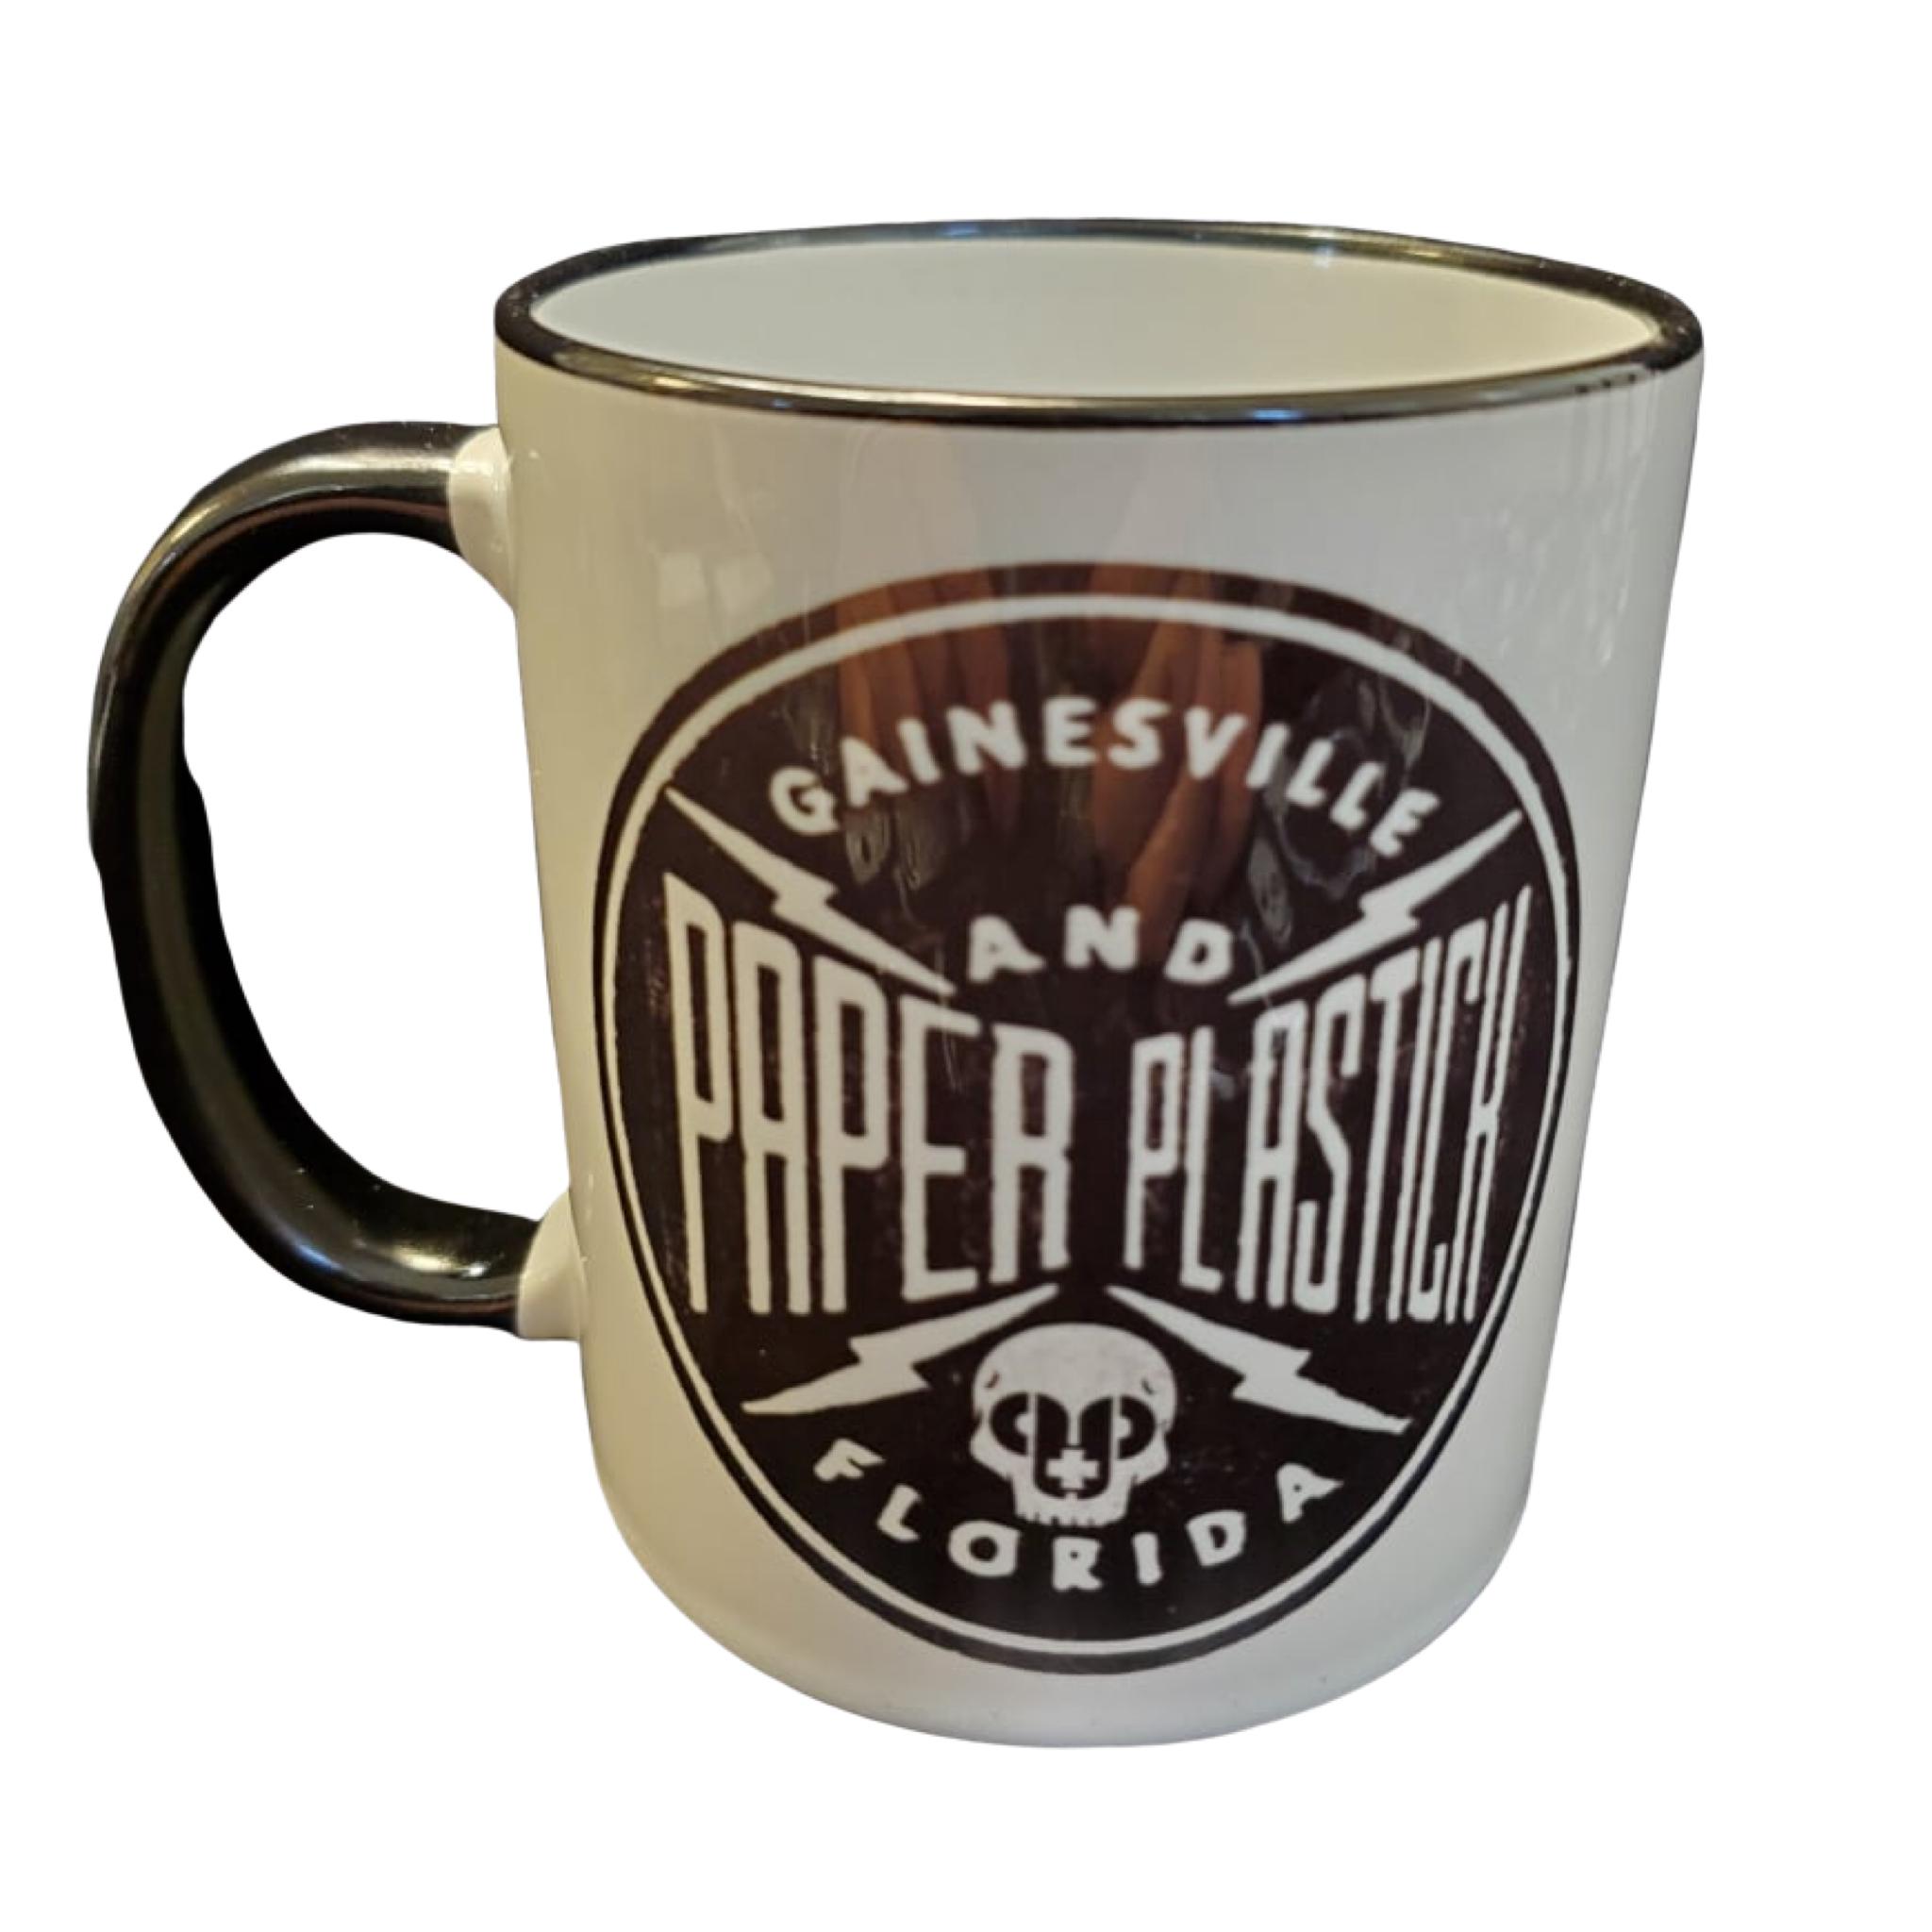 Limited Two tone Round P+P Logo Ceramic Mug